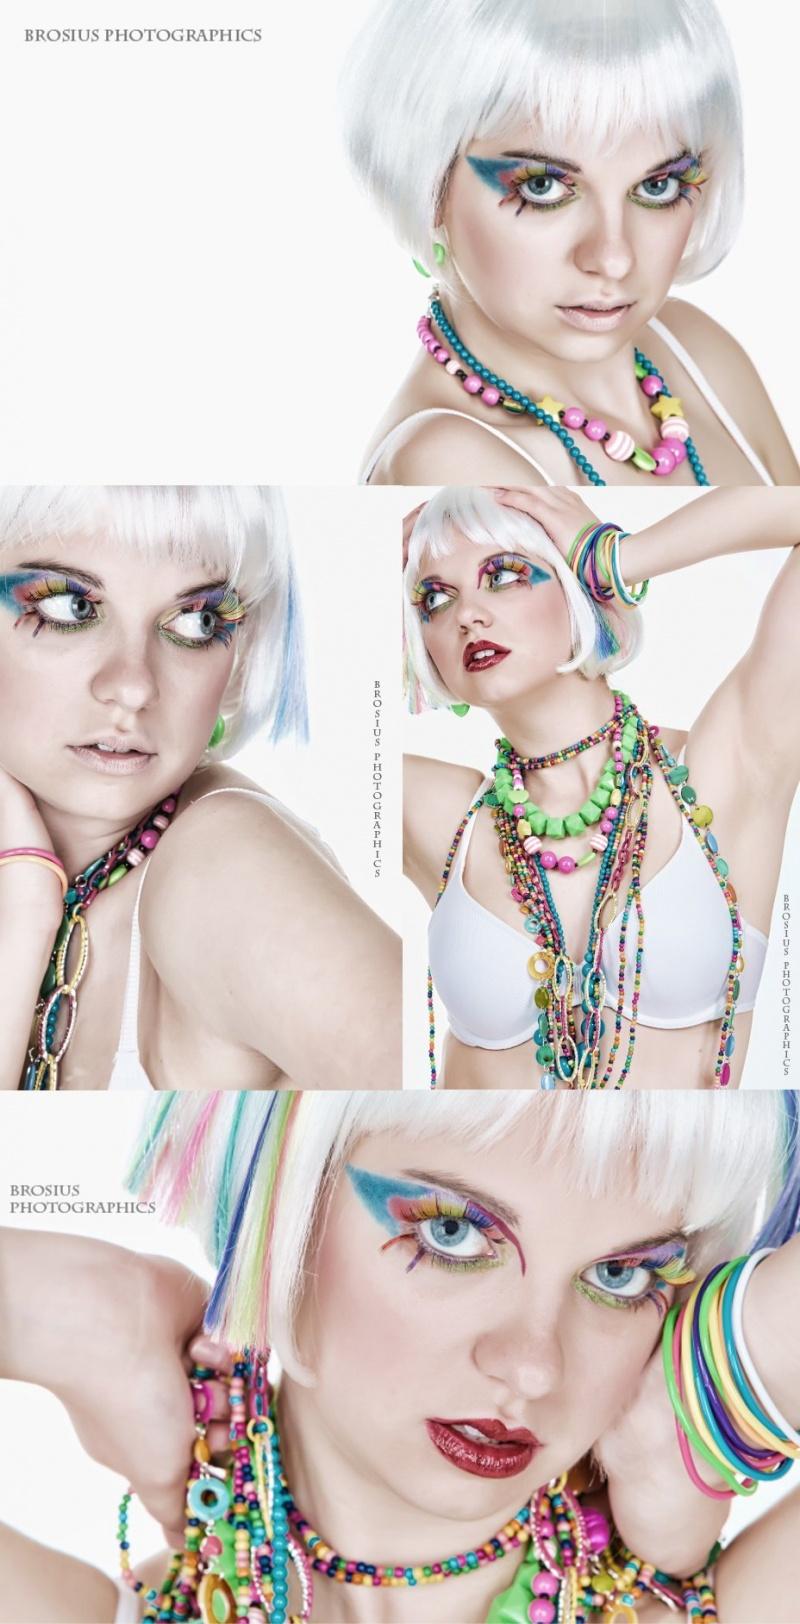 Houston, PA May 12, 2009 Brosius Photographics 2009 Rainbow Bright.